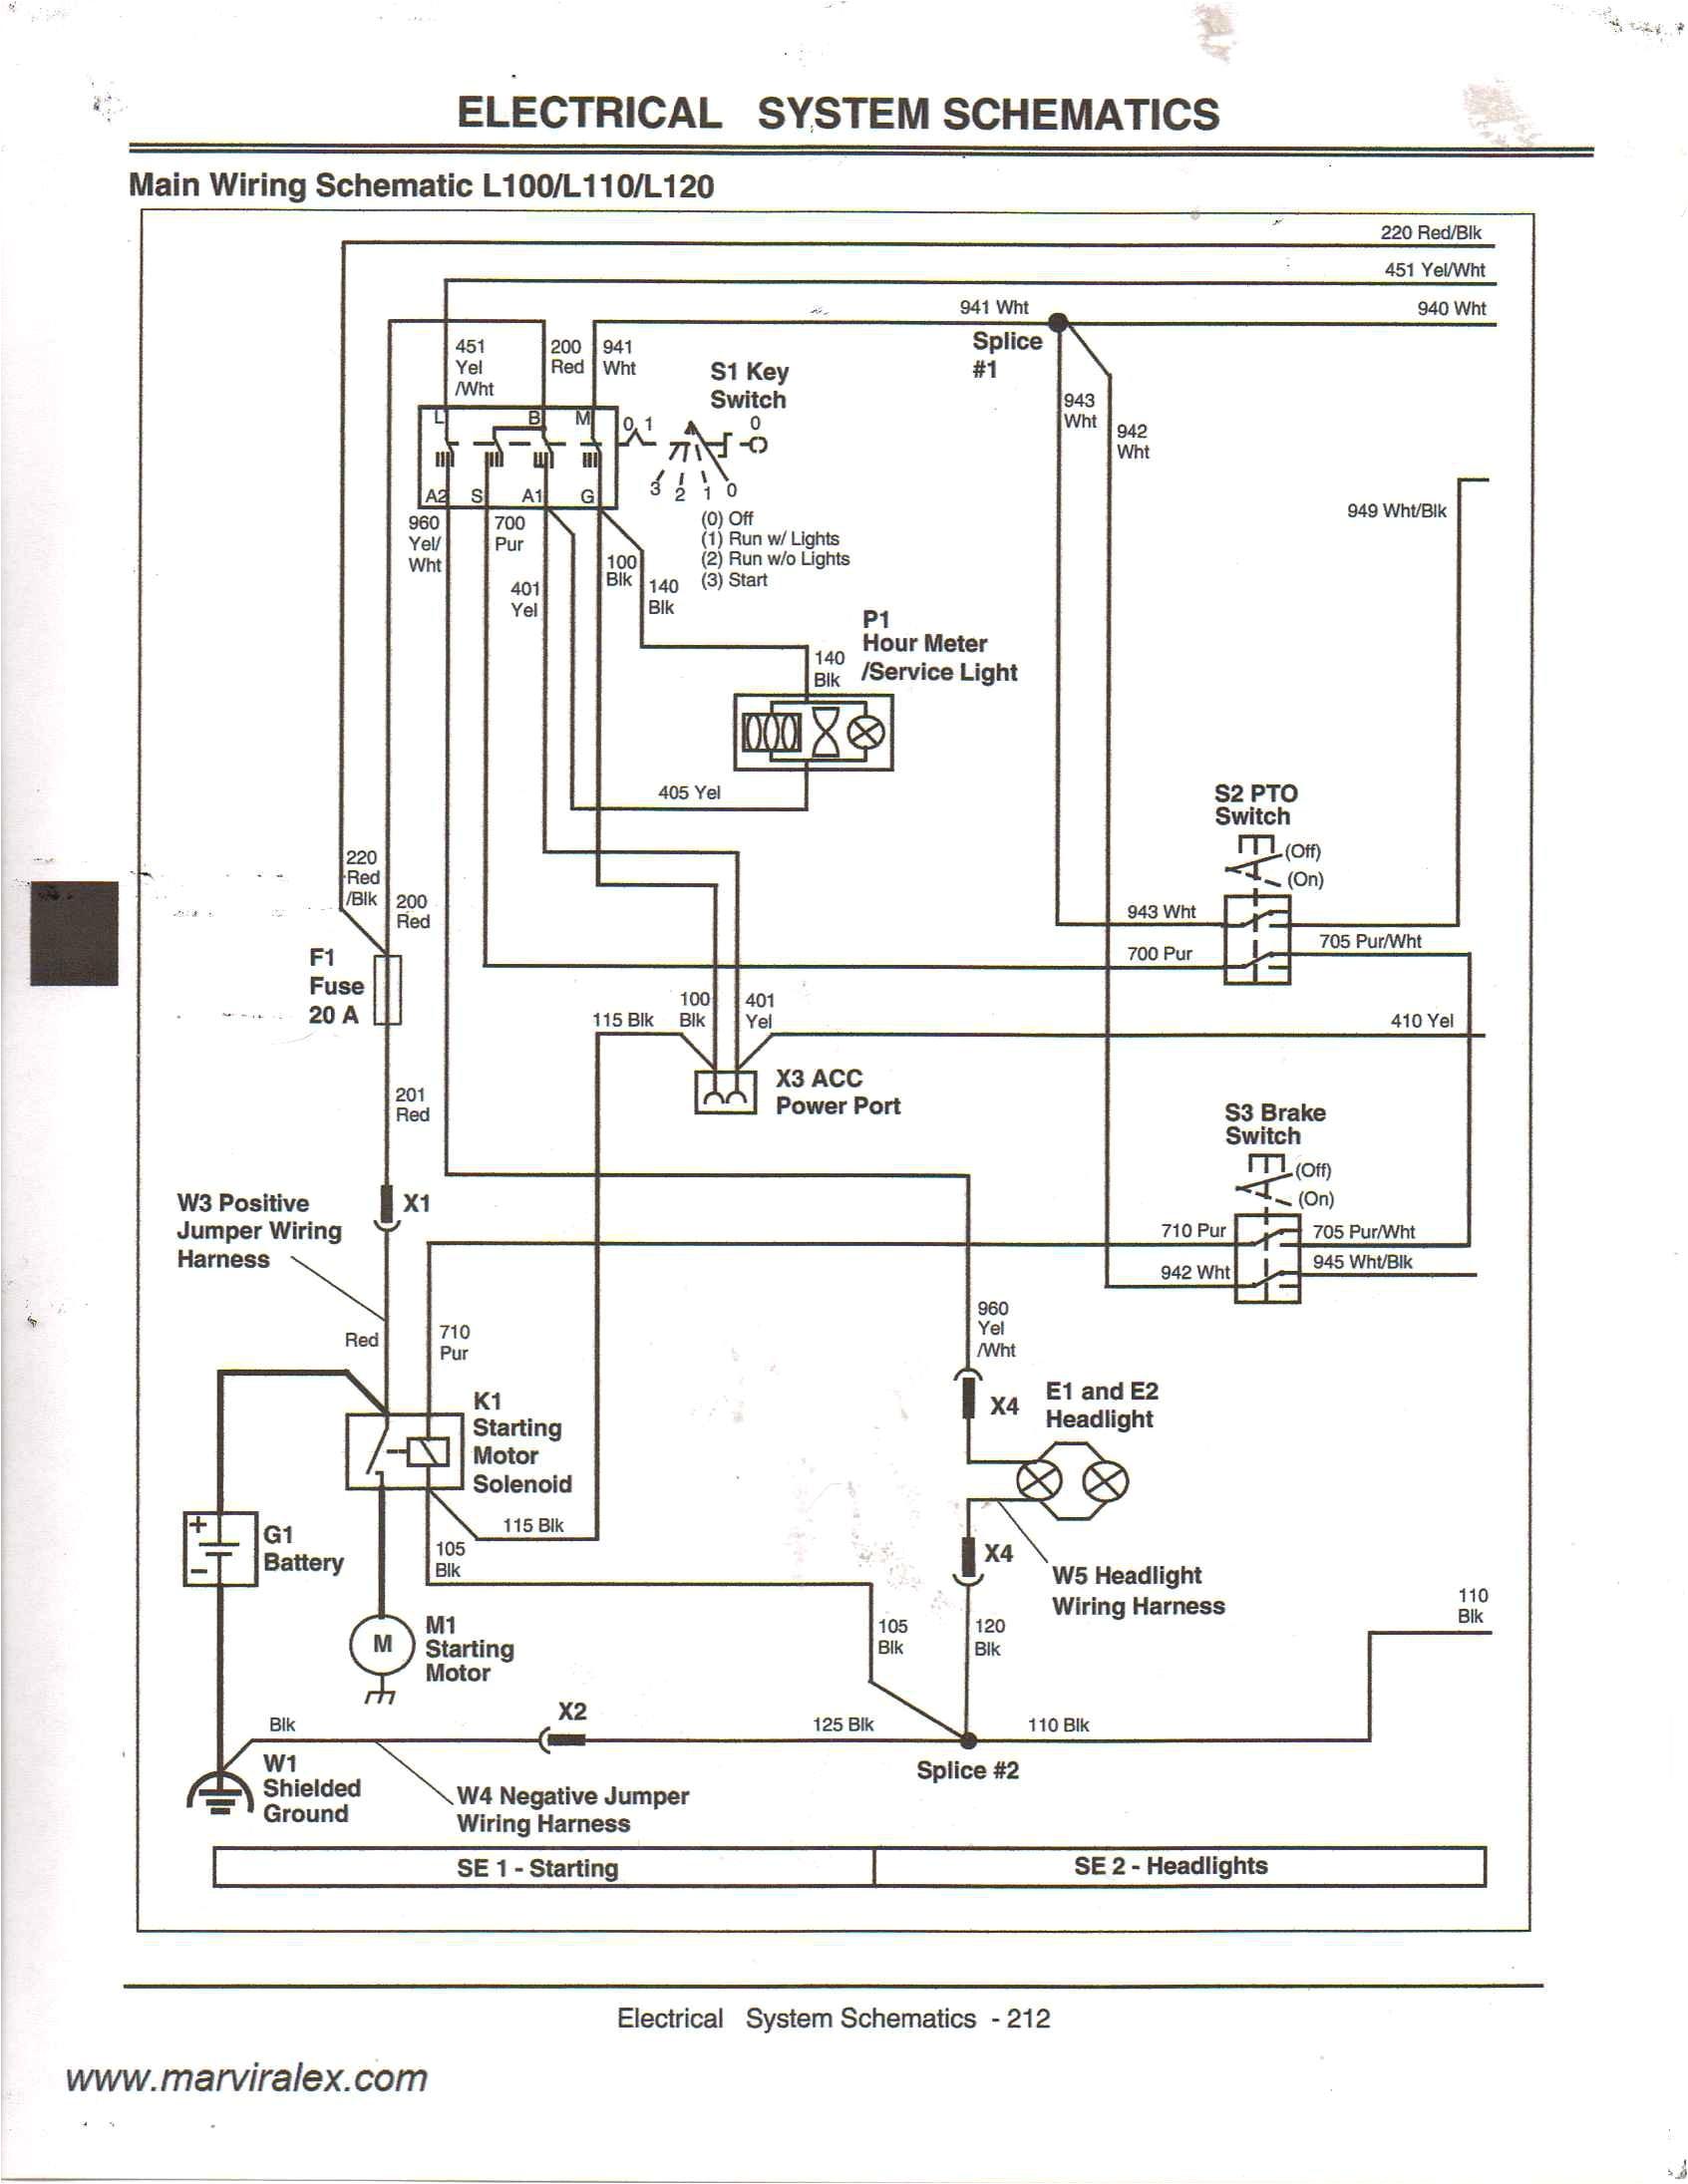 john deere 650 wiring diagram wiring diagram schemajohn deere 650j wiring diagram wiring diagram name john